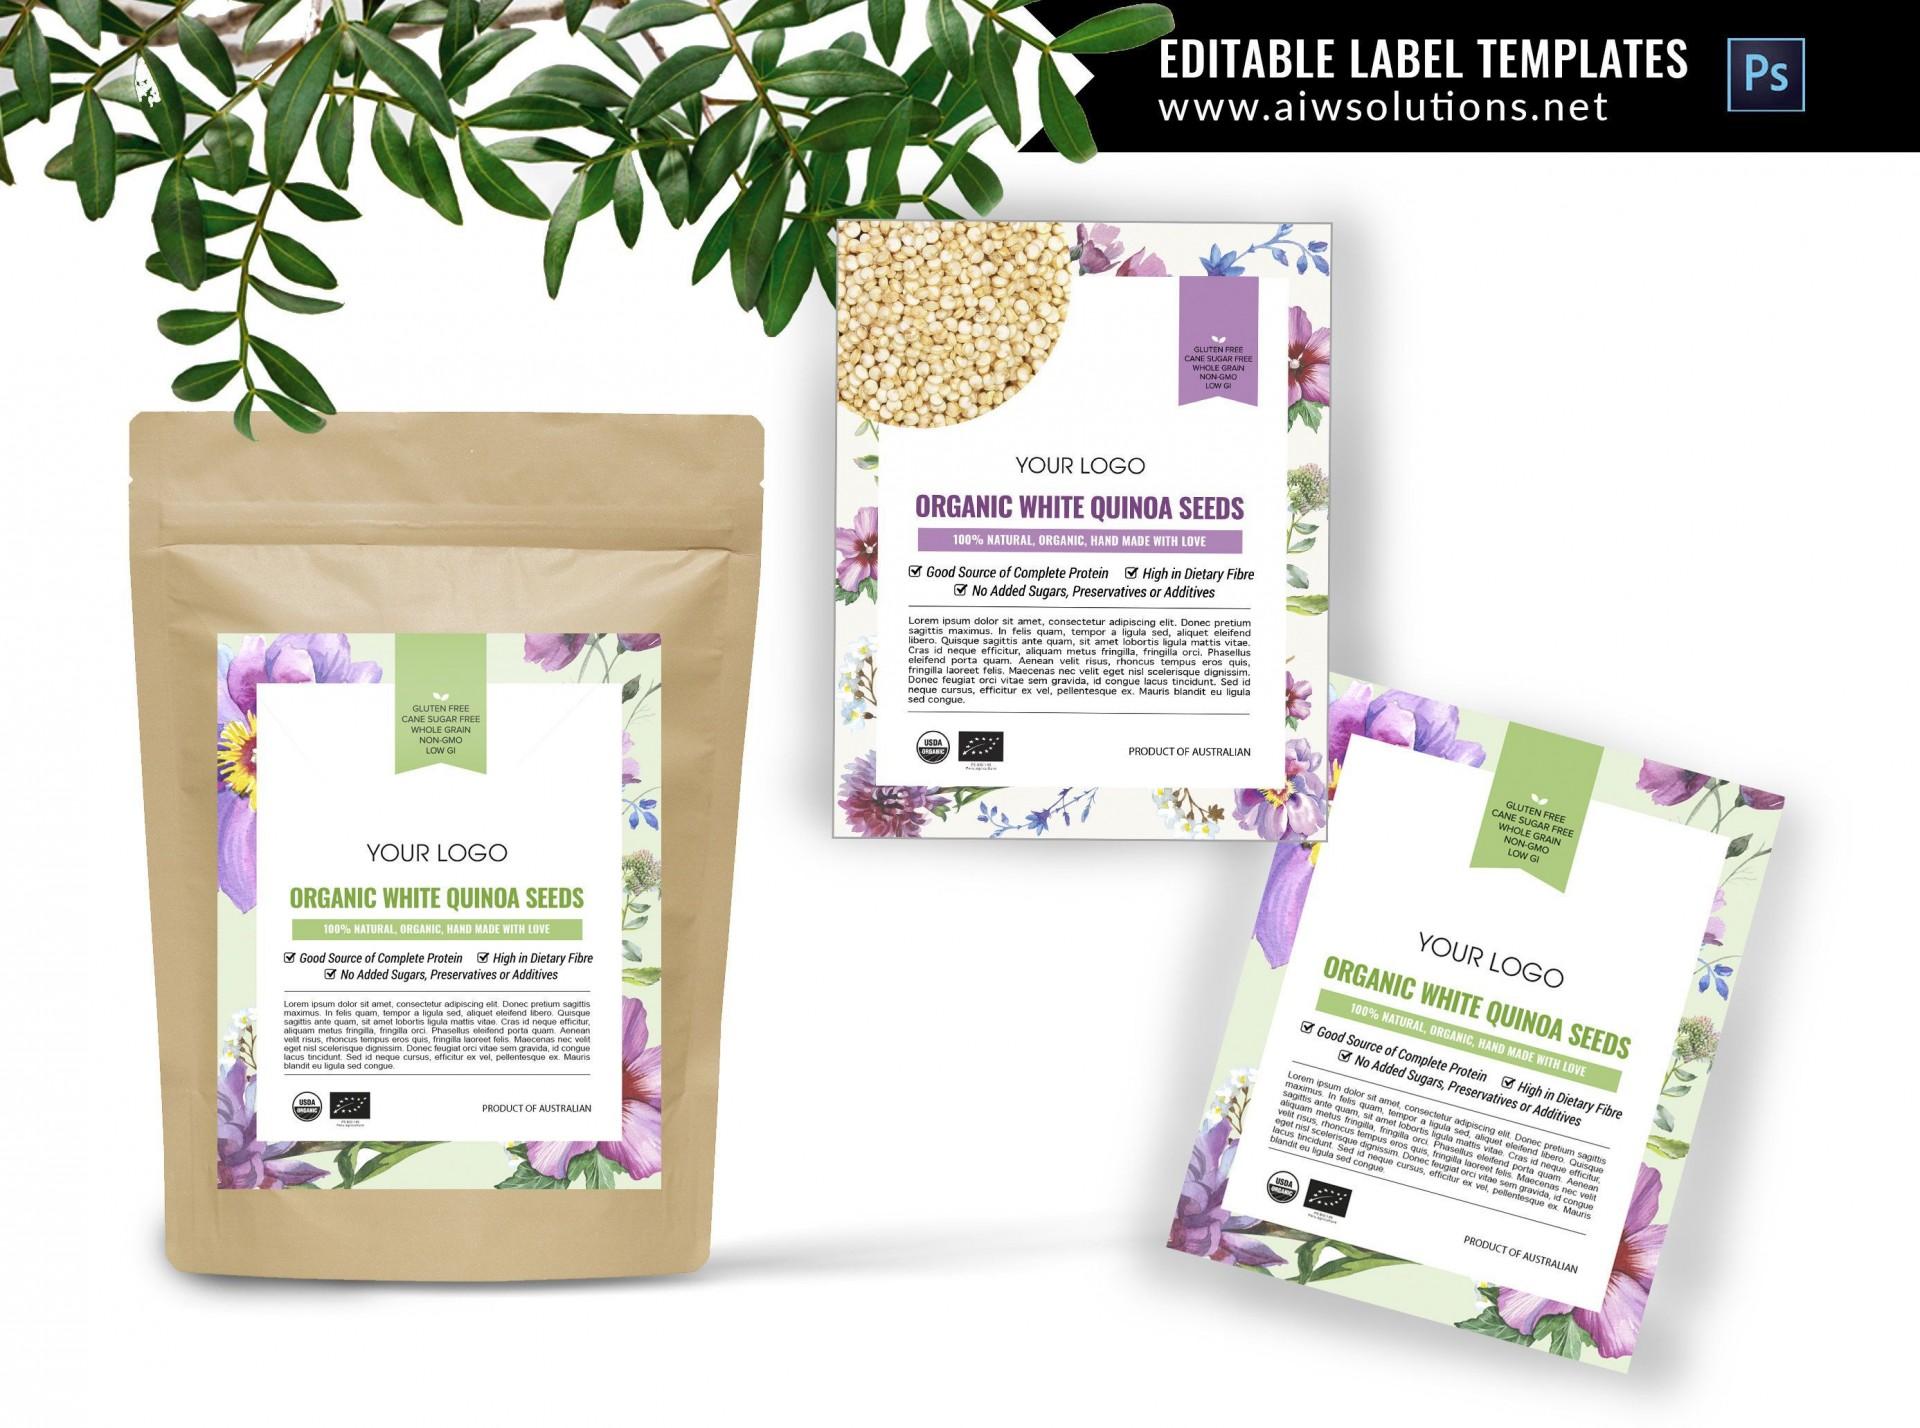 000 Stupendou Free Food Label Design Template Inspiration  Templates Download1920